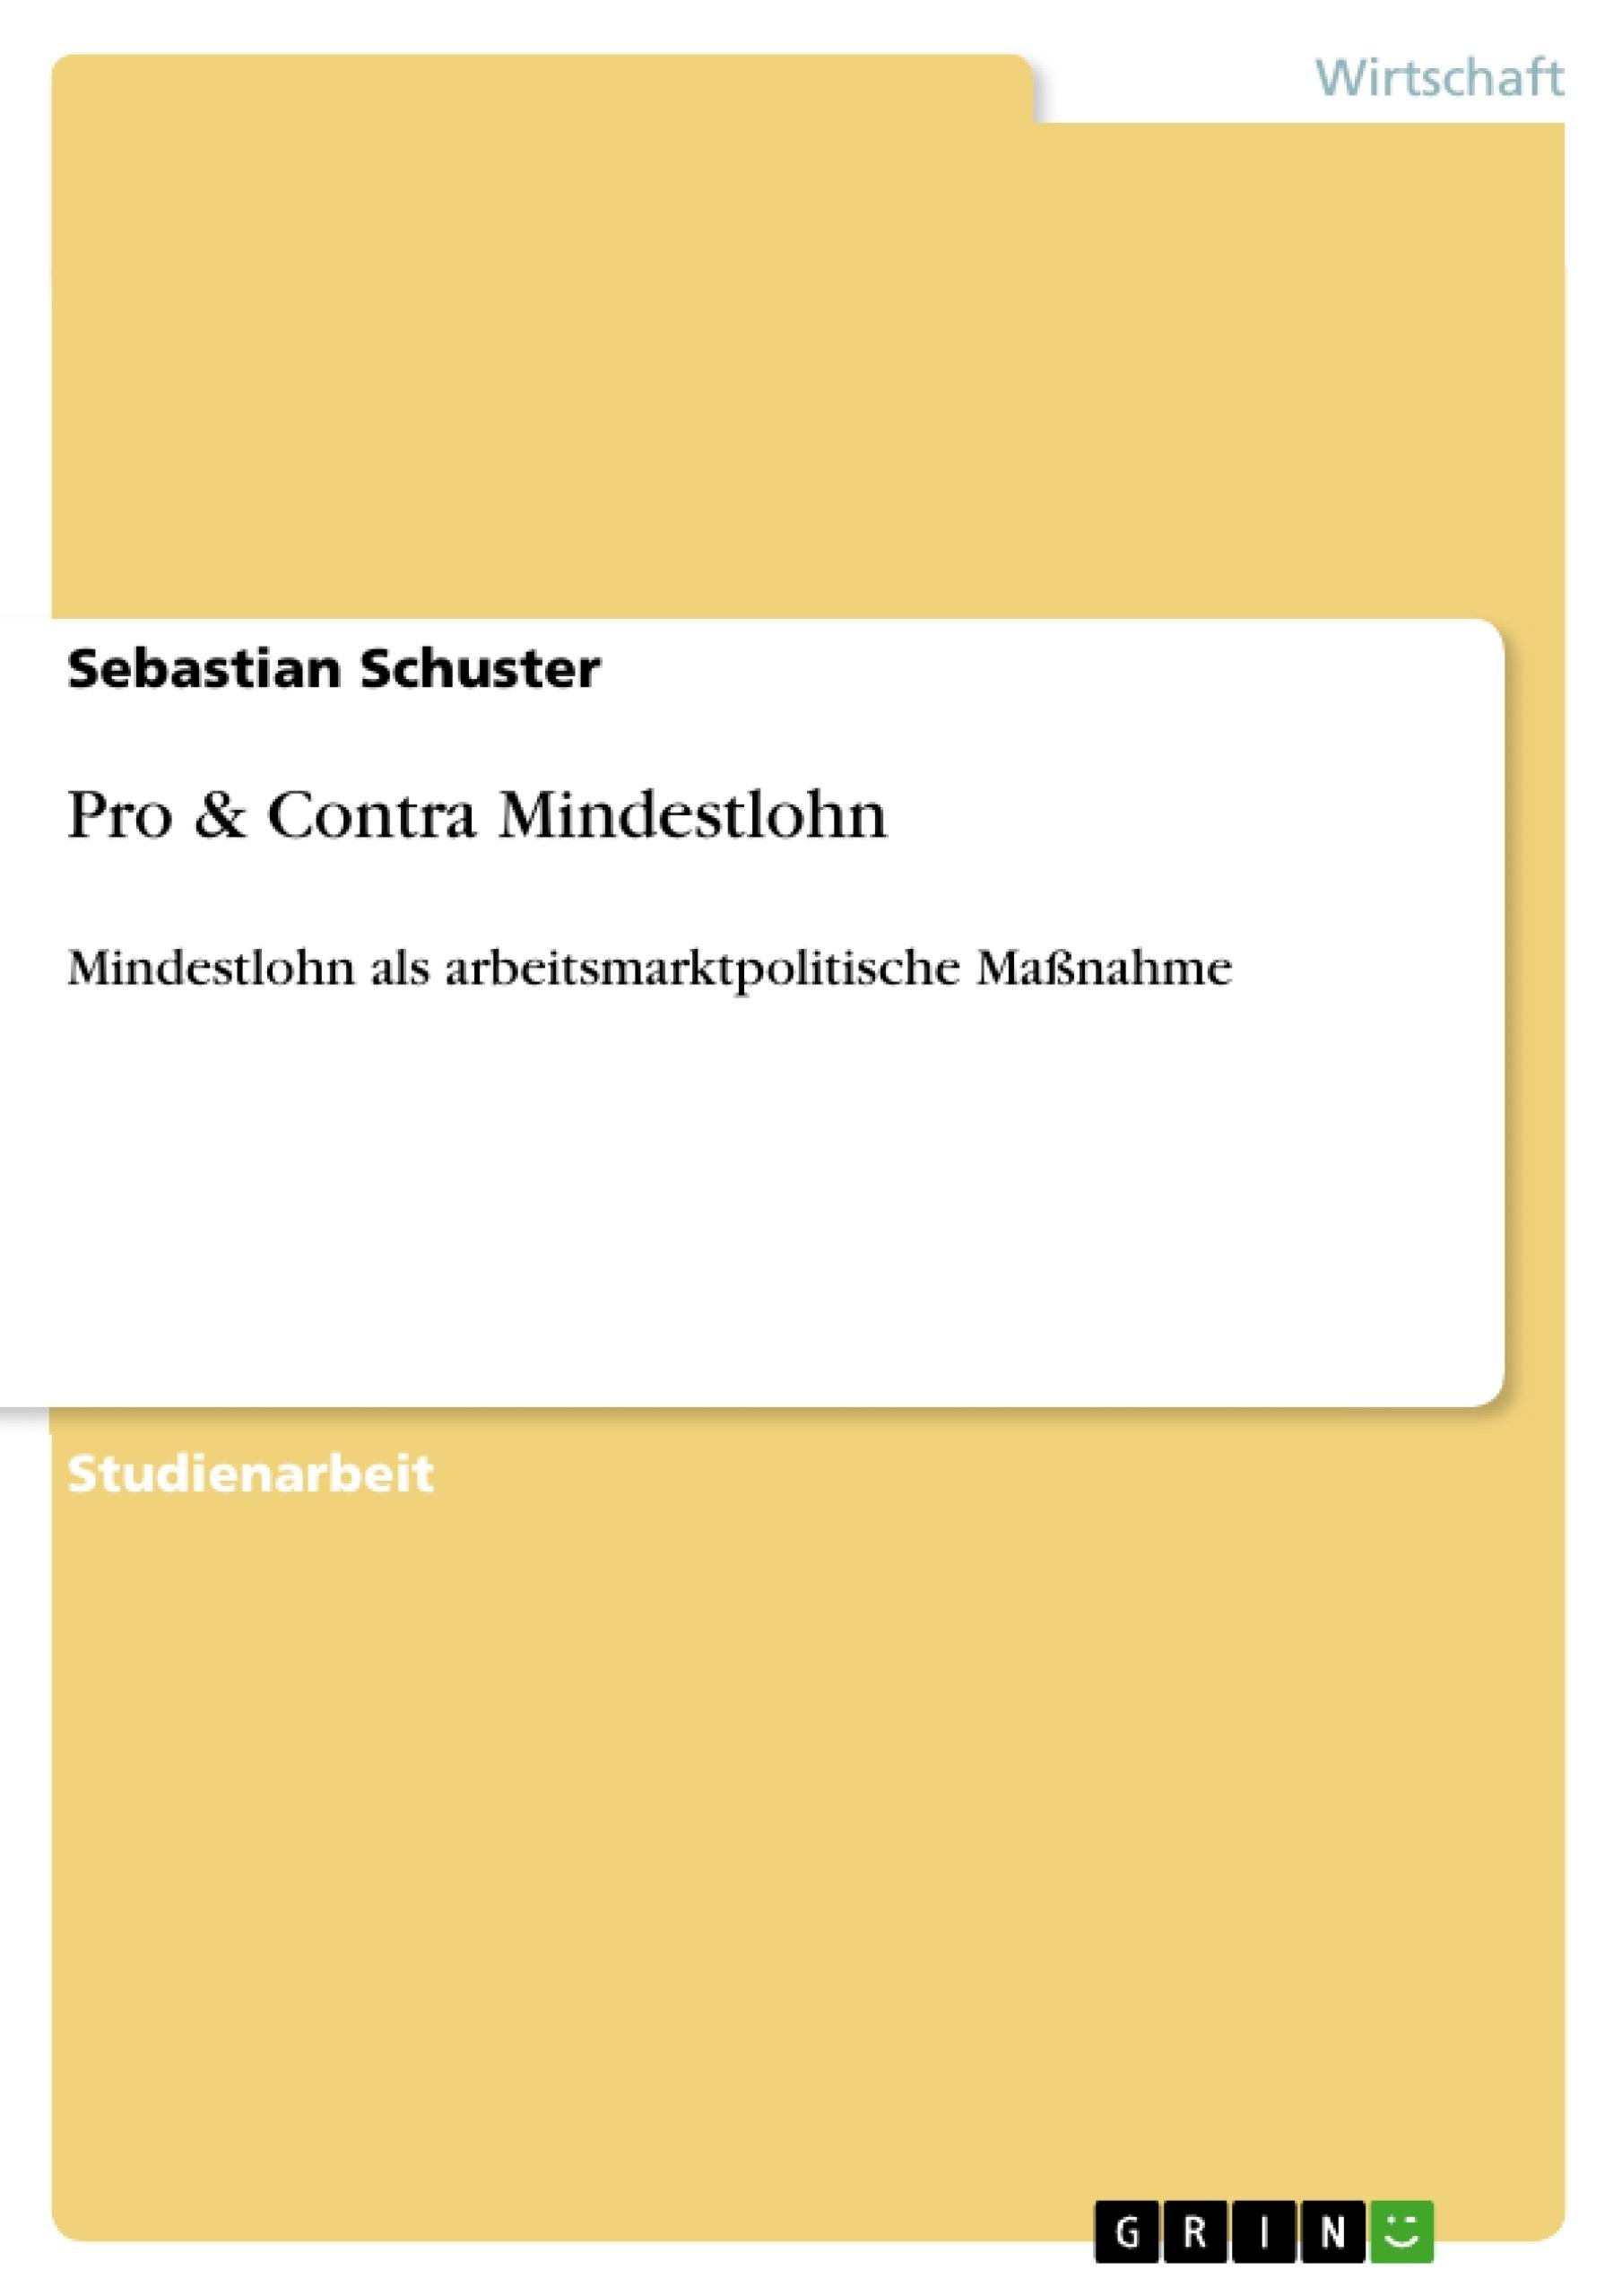 Titel: Pro & Contra Mindestlohn